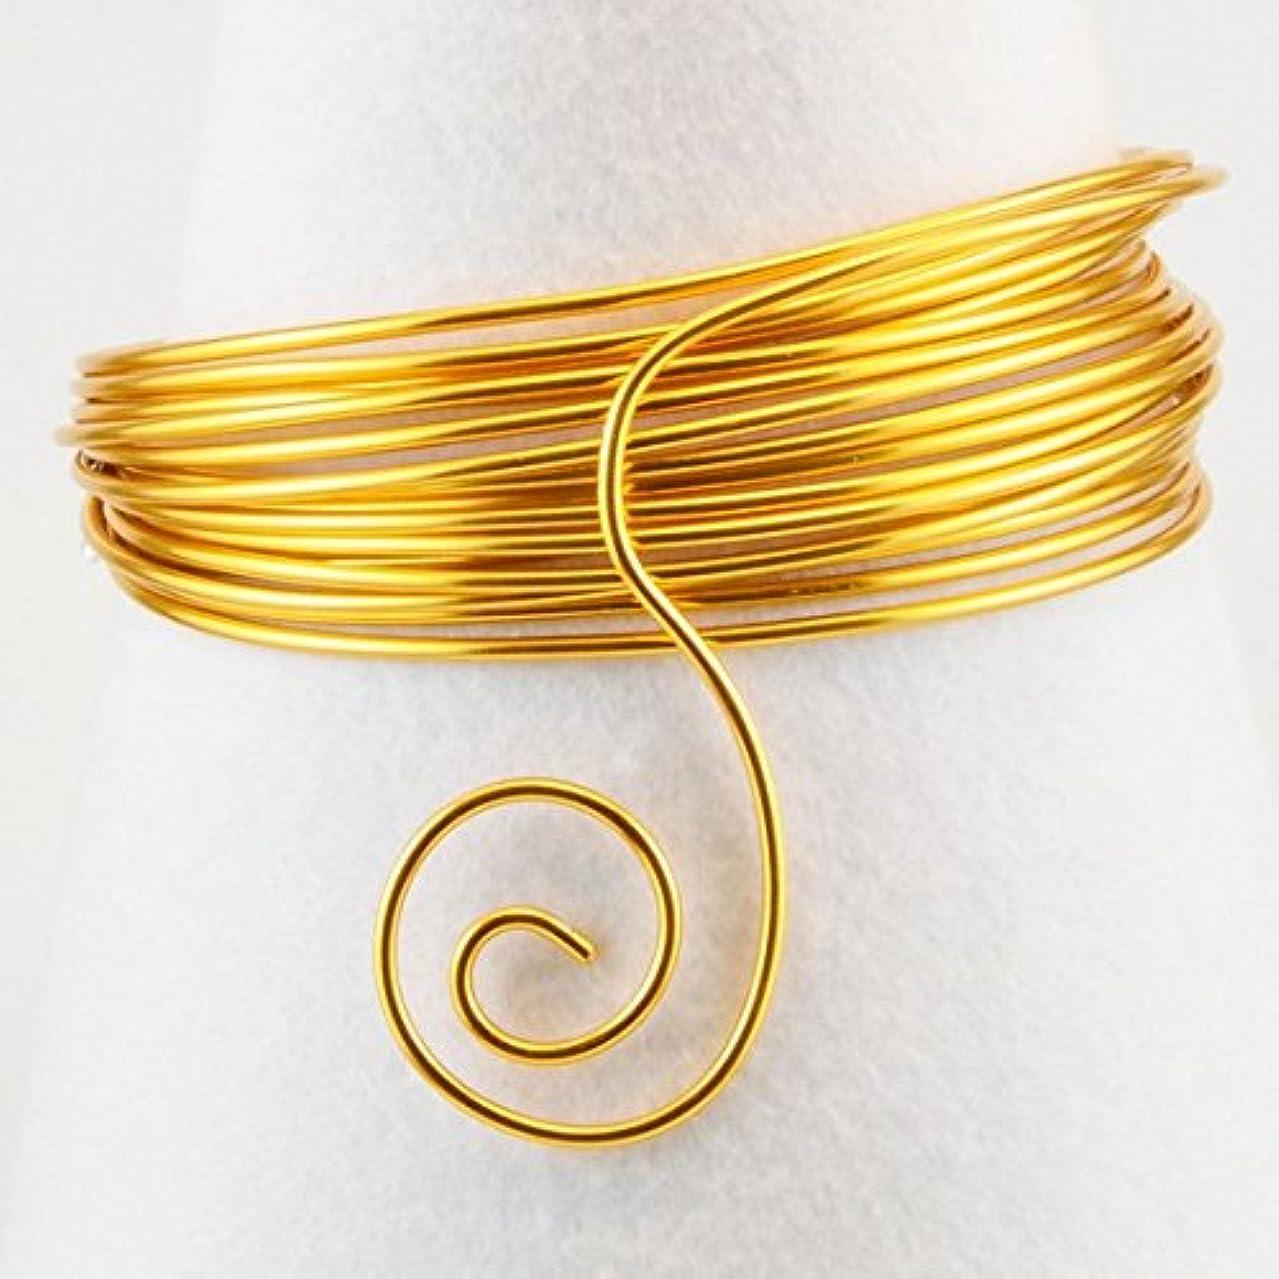 Vaessen Creative Aluminium Wire, Gold, One Size